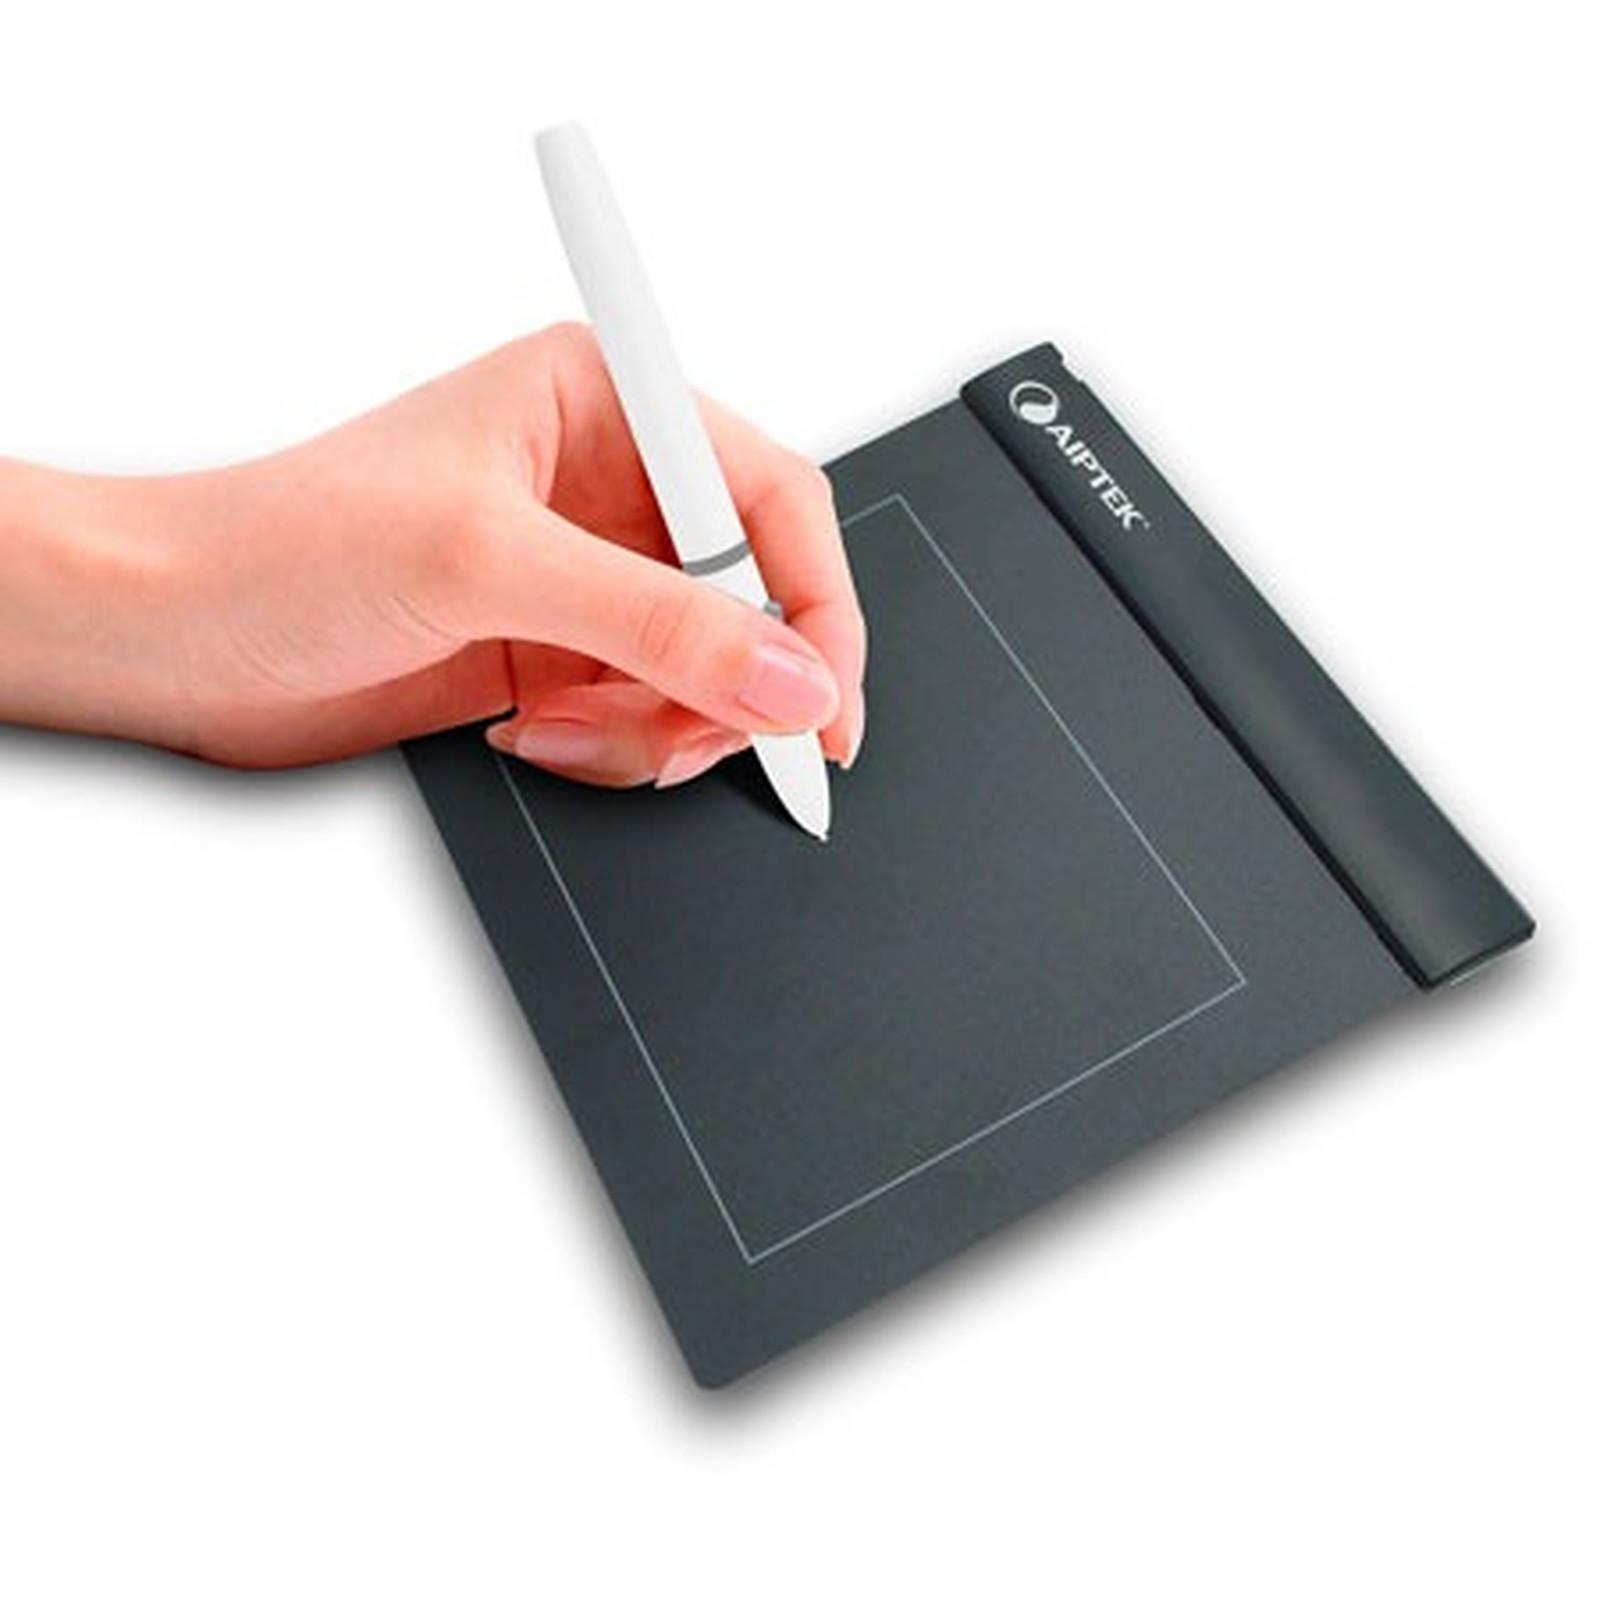 Aiptek Hyper Pen Mini Noir